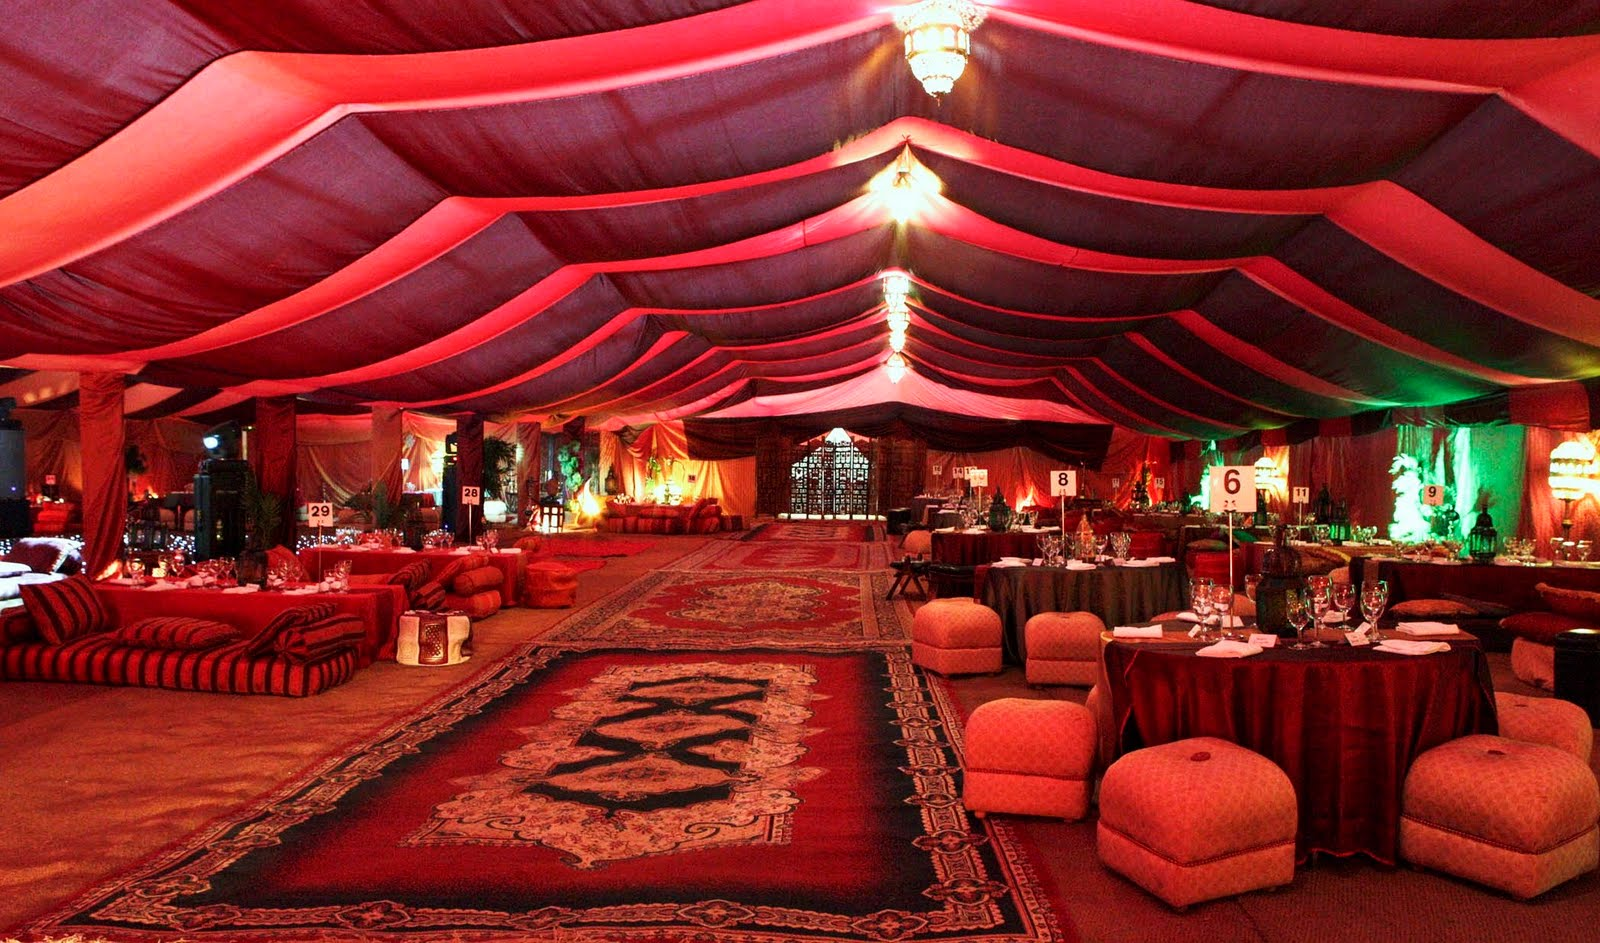 Shontreals Blog Teal And Orange Wedding Theme